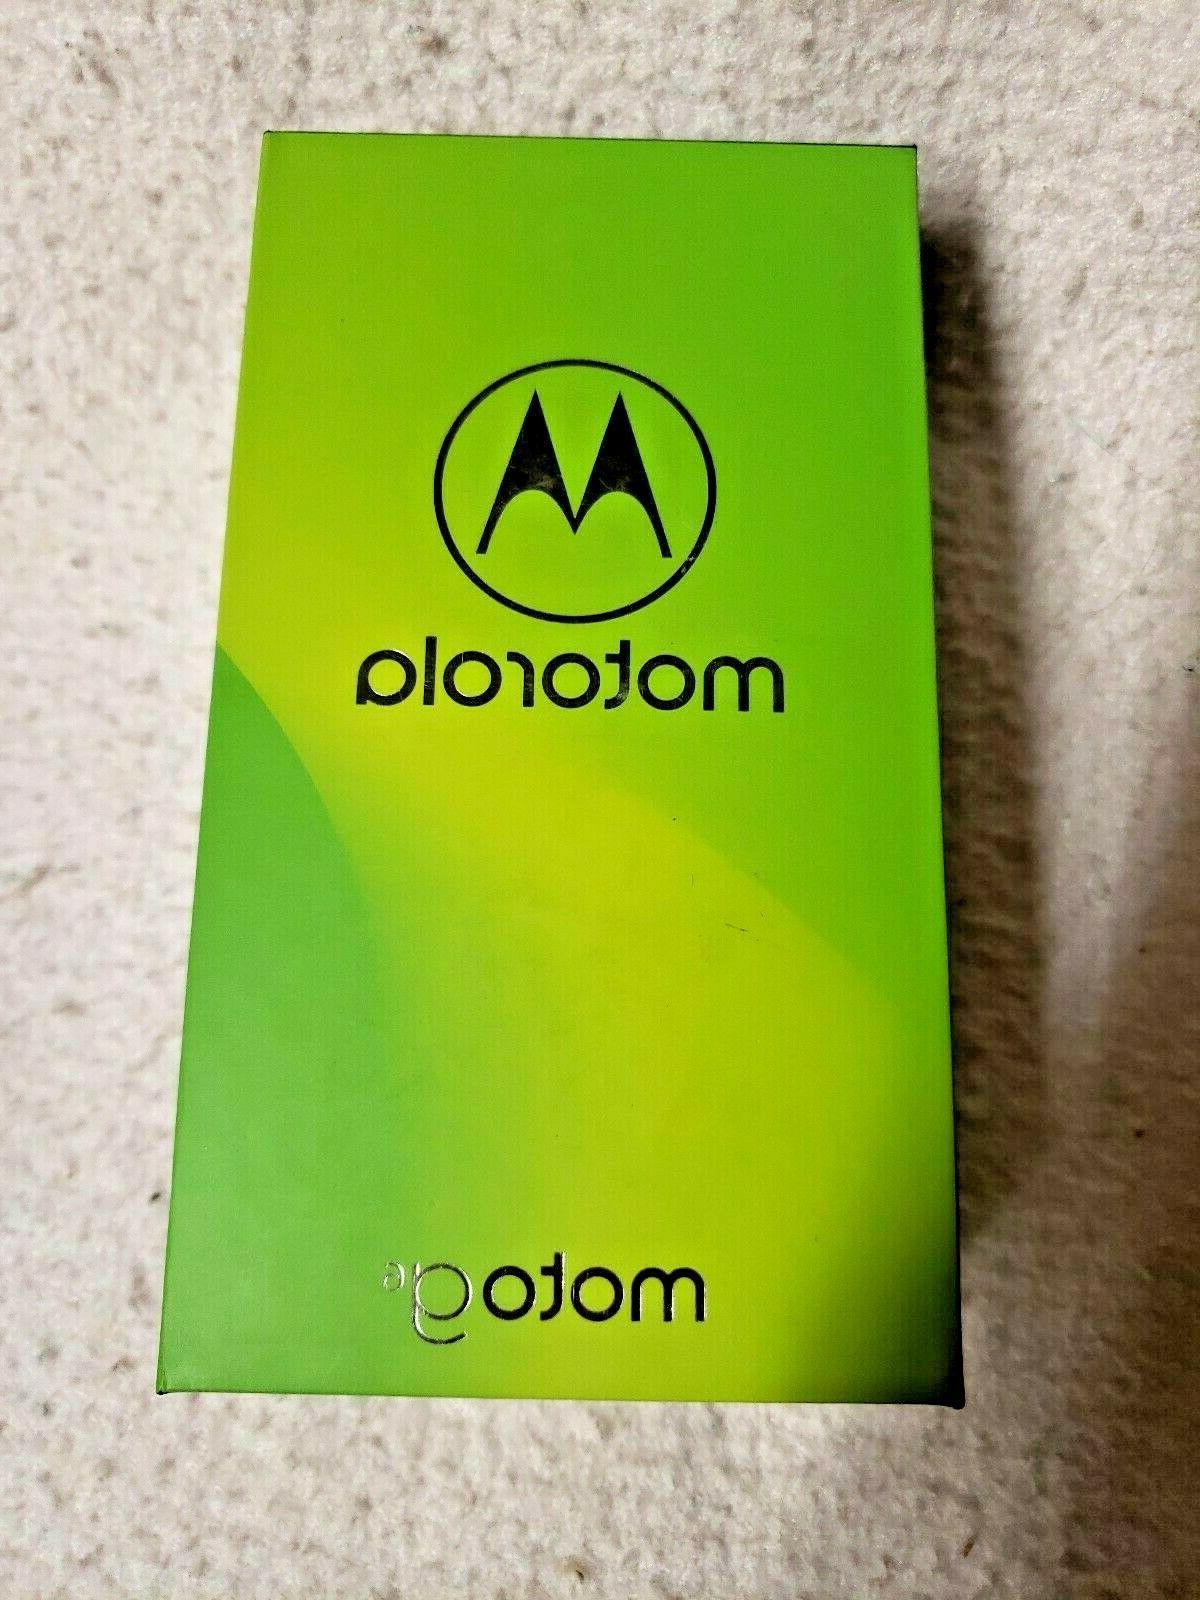 Moto G6 – 32 GB – Unlocked  – Oyster Blush - Prime Exc